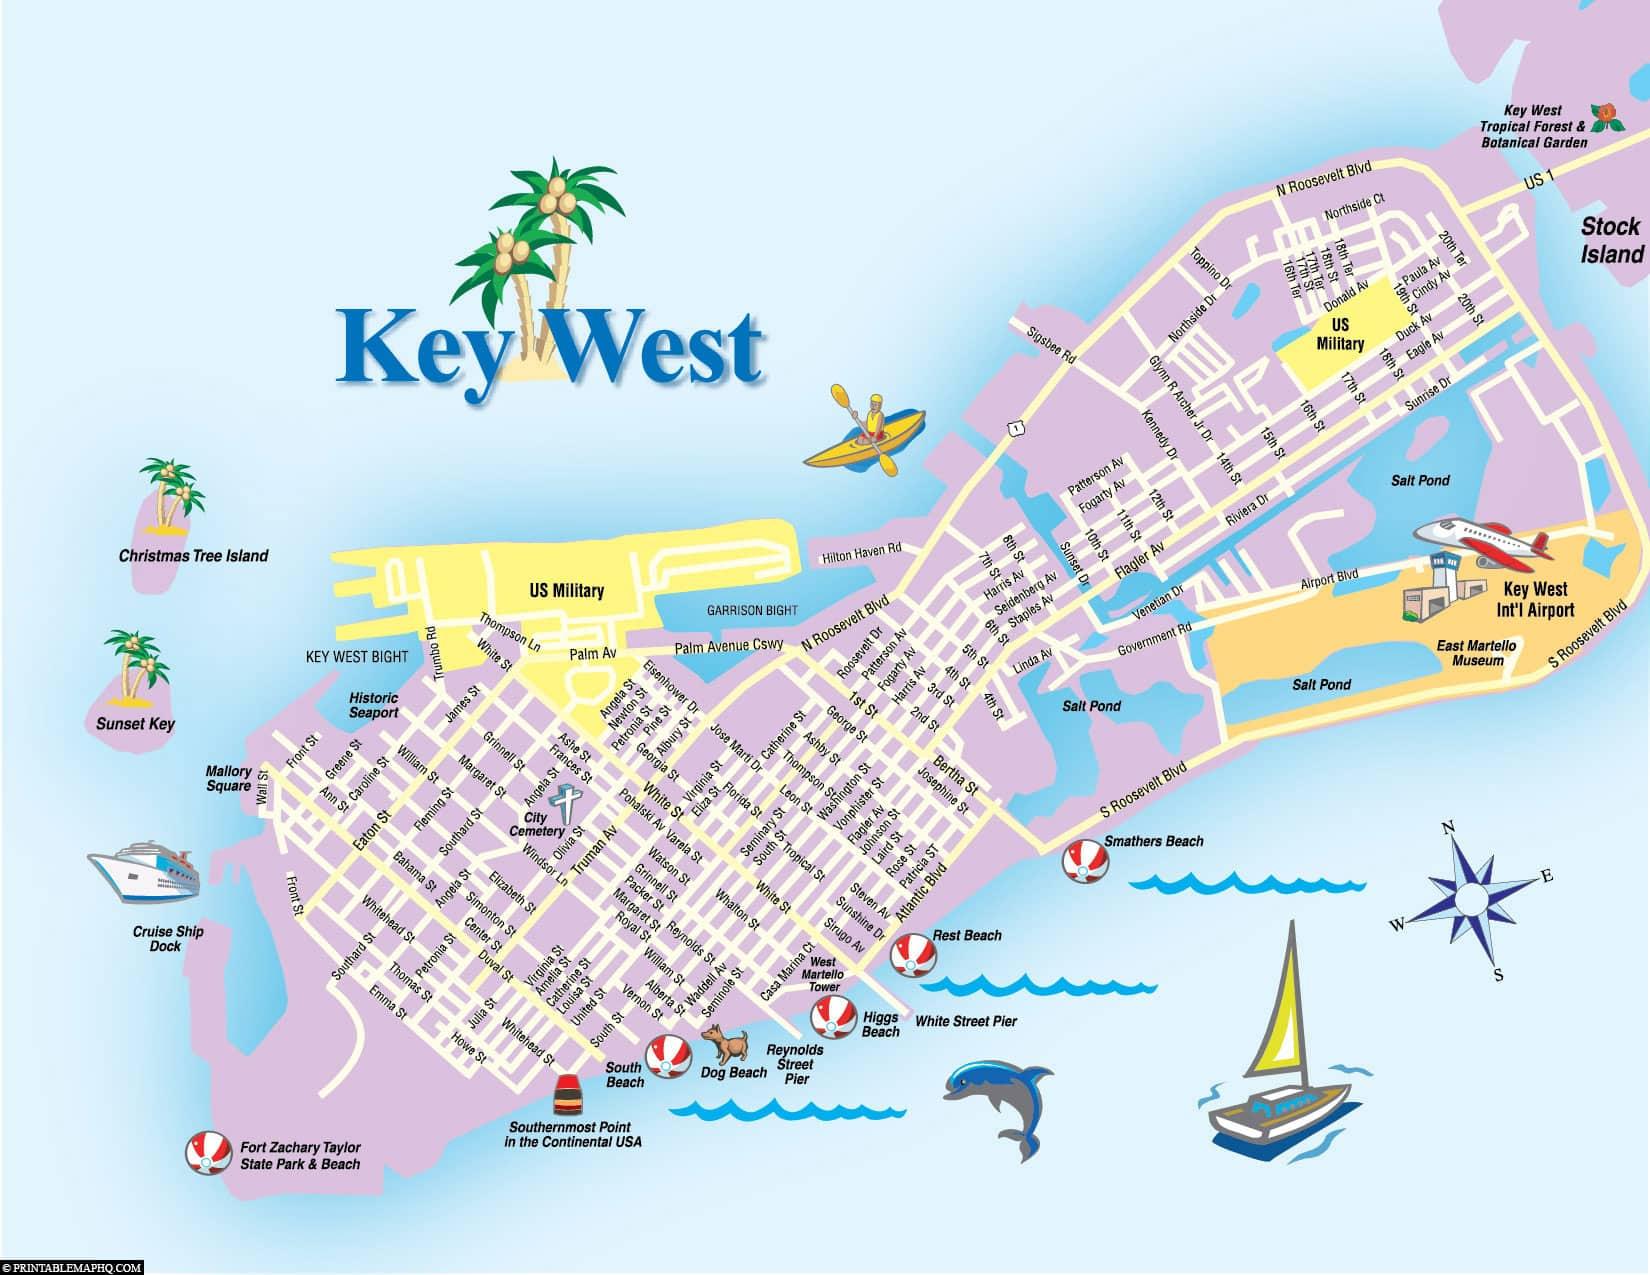 Key West, Map, Florida Keys, Plan, USA, Travelreport